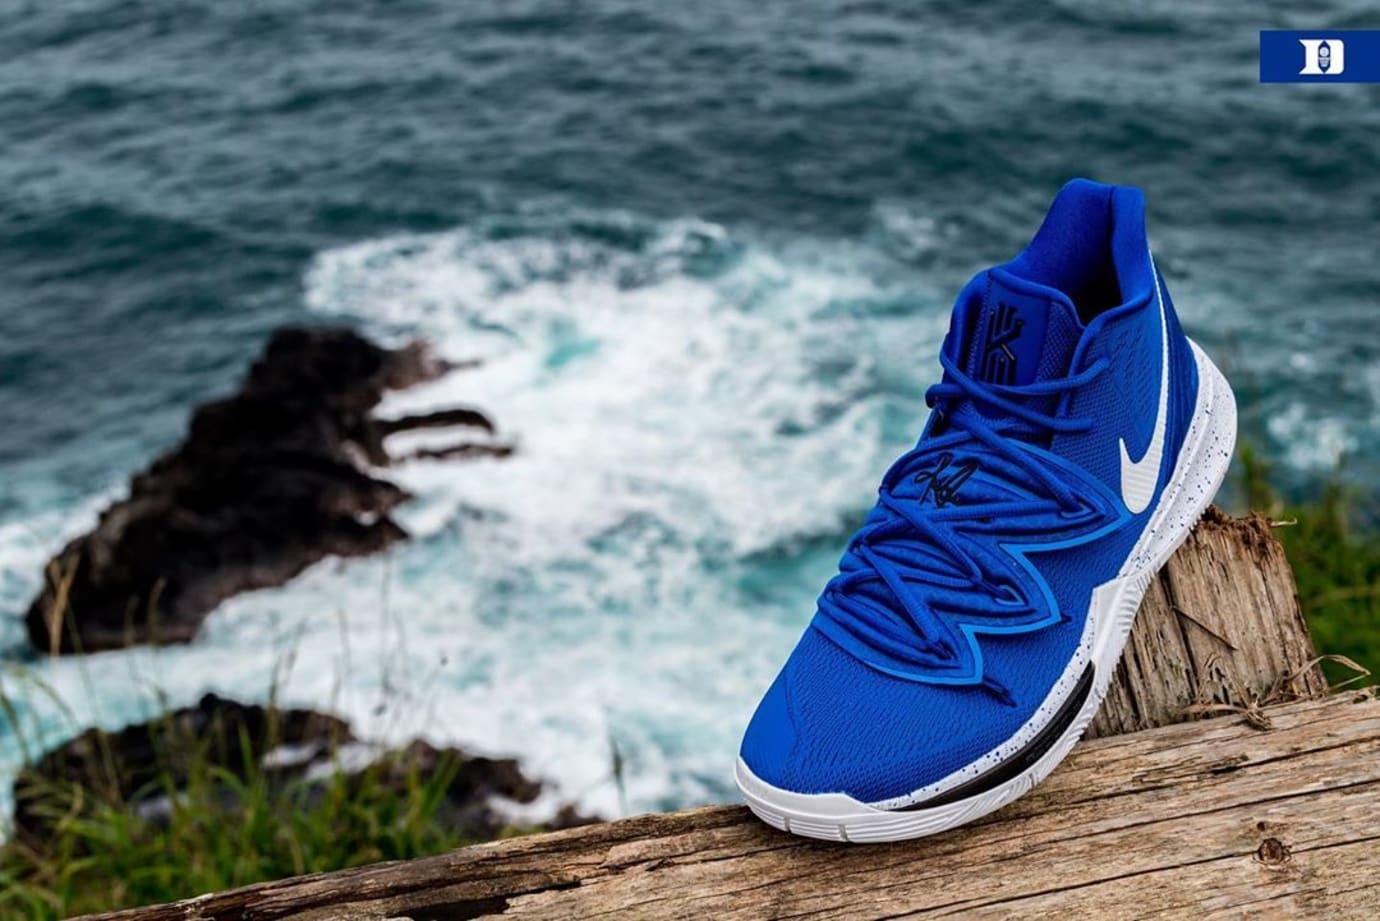 Nike Kyrie 5 'Duke' PE Blue (Front)